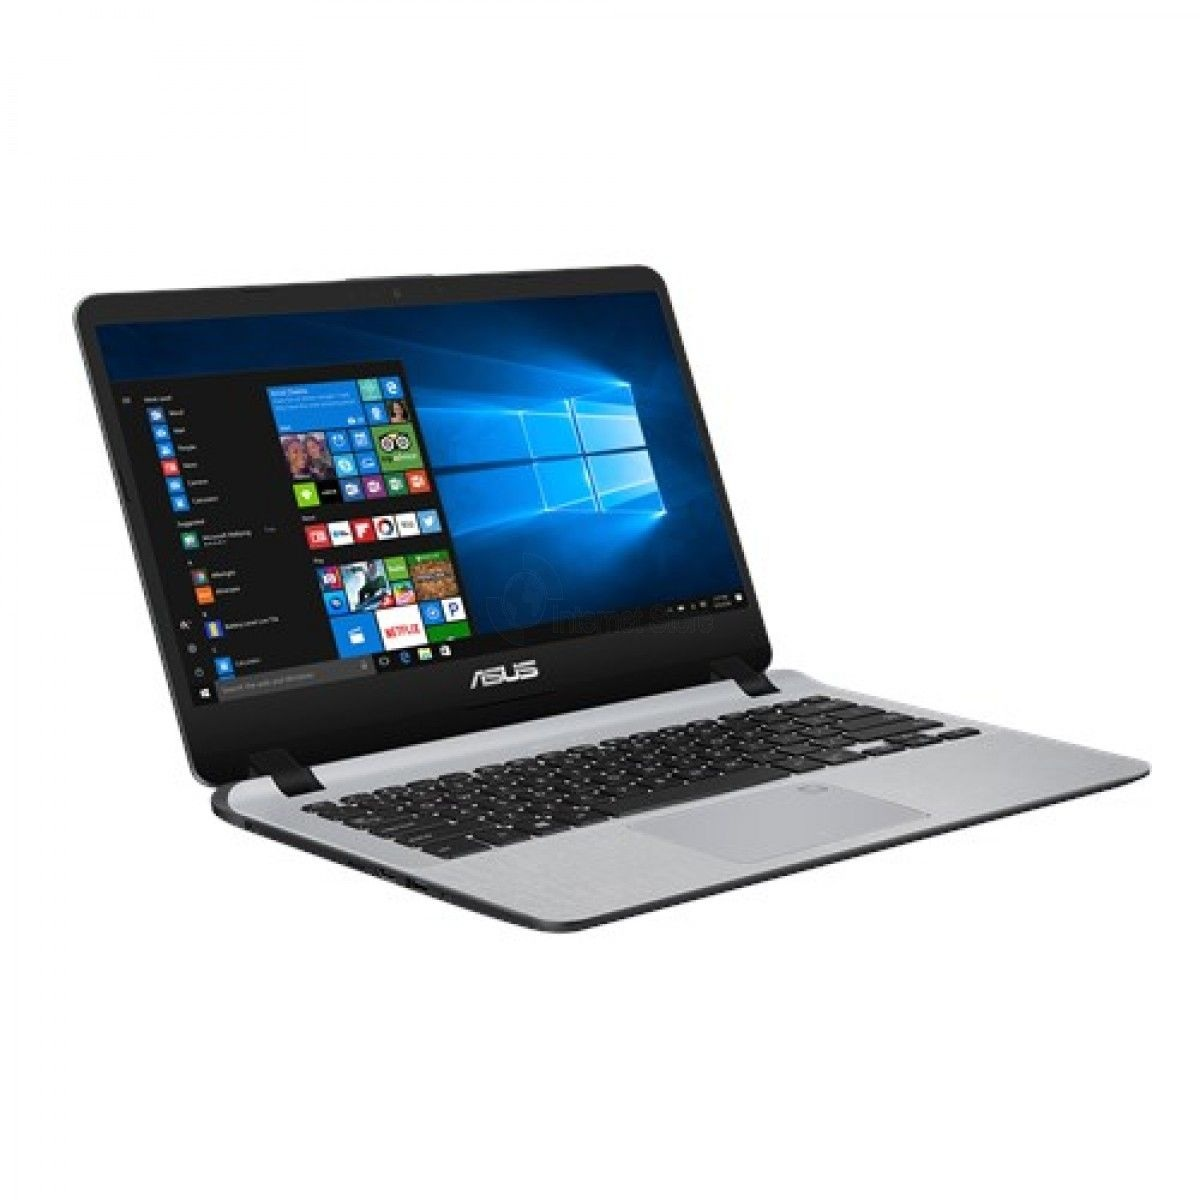 NOTEBOOK ASUS X407MA-BV069T C-D N4000 1.10GHzUP TO 2.6G 4M 4G 500G 14.0 VGA INTEL WIN10 GRAY ,Laptop Pc